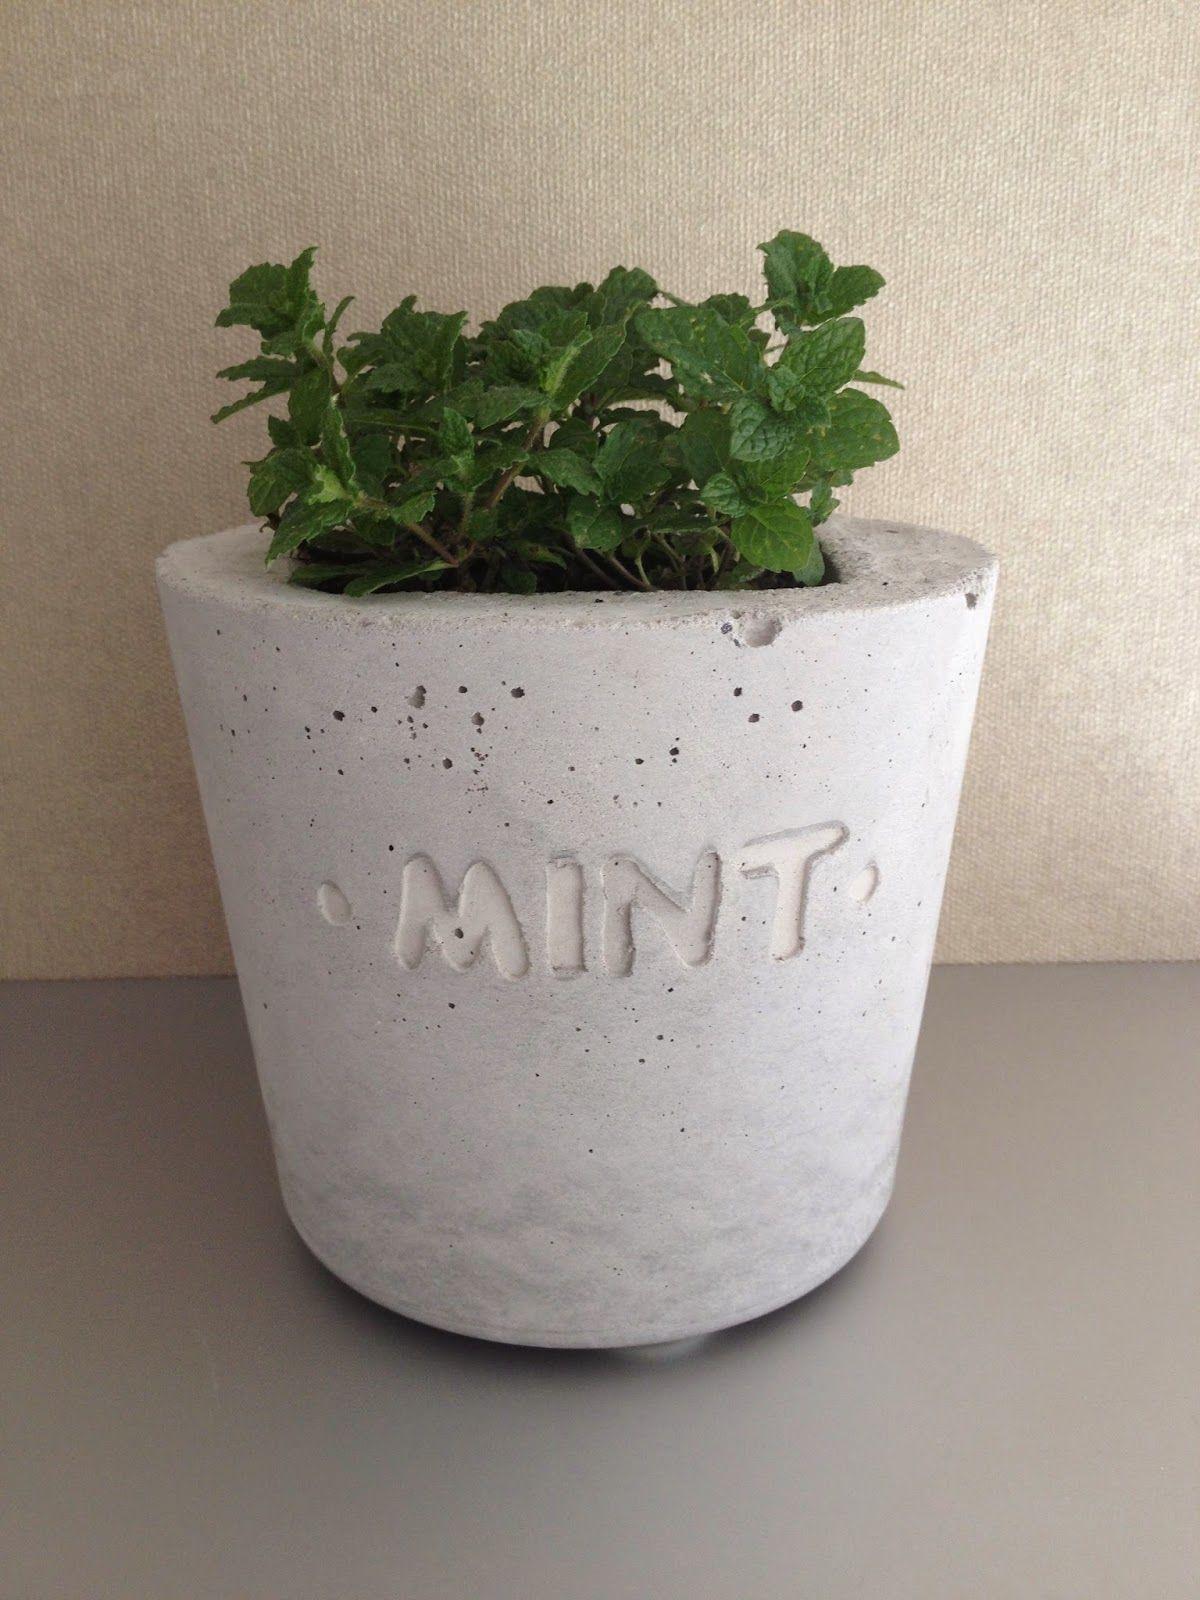 wohnbrise: kräutertopf, beton topf, mint, | diy: concrete & cement